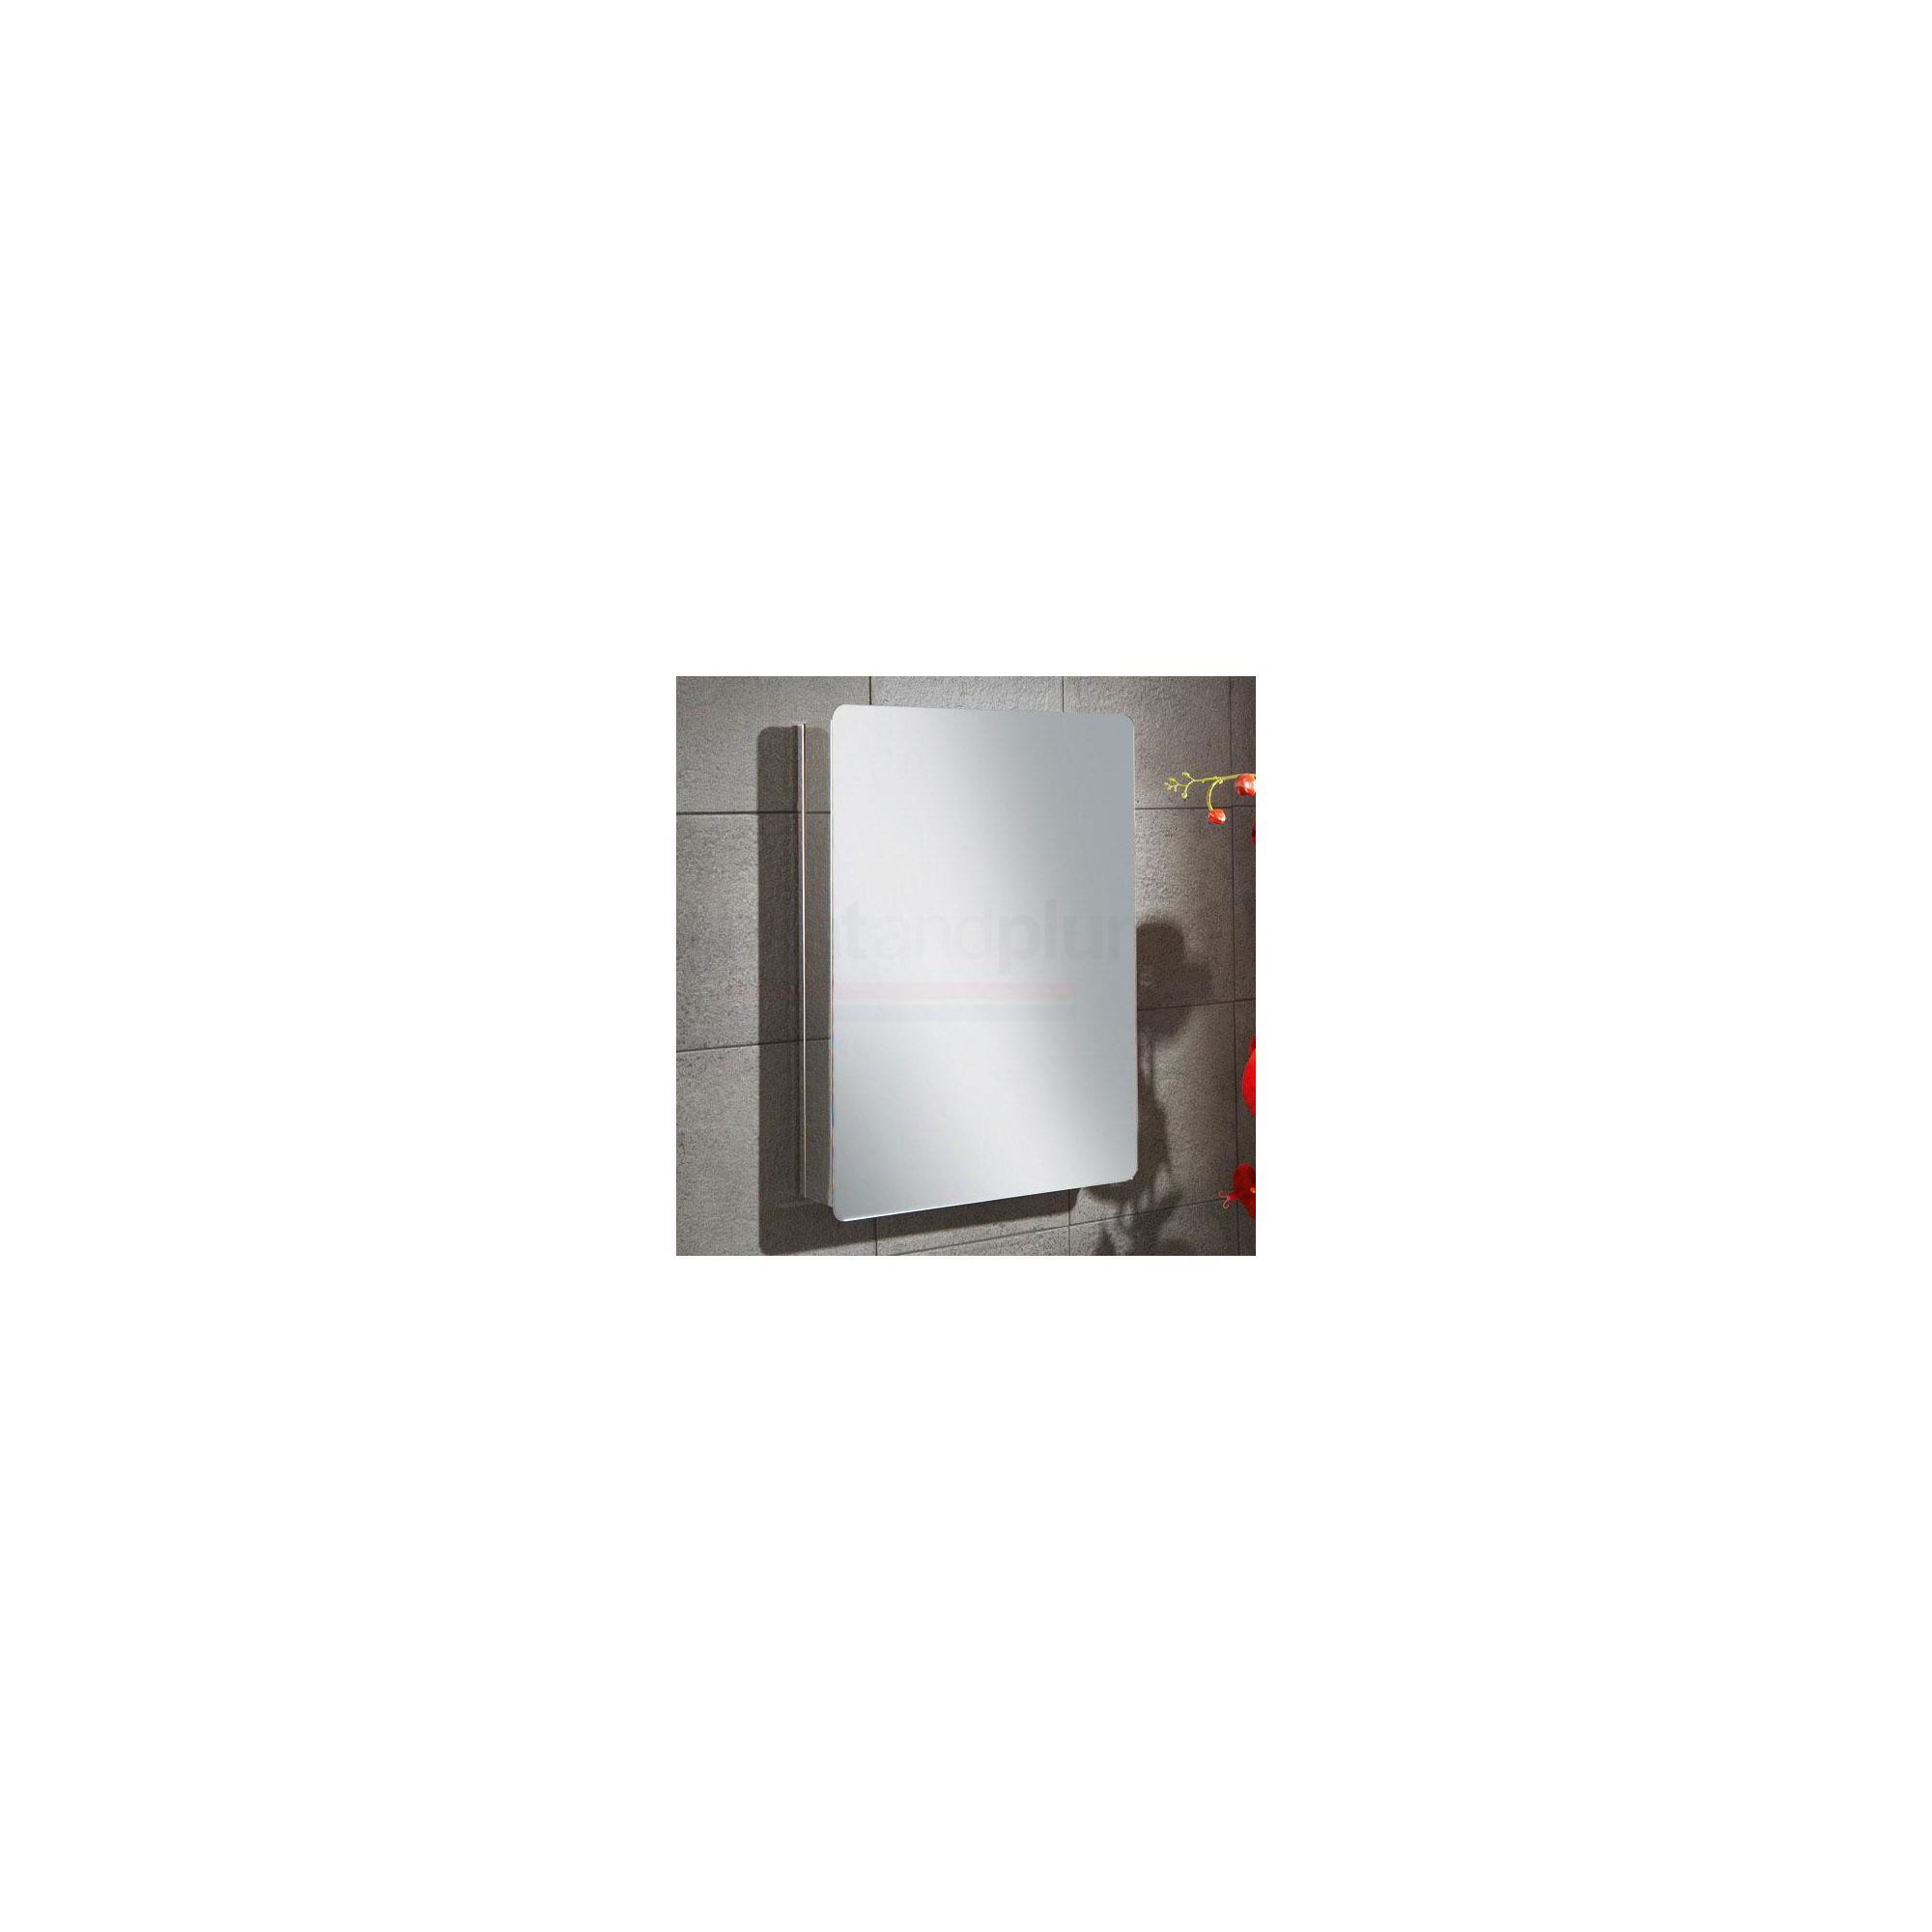 HiB Melia Stainless Steel Bathroom Cabinet 650mm High x 450mm Wide x 105mm Deep